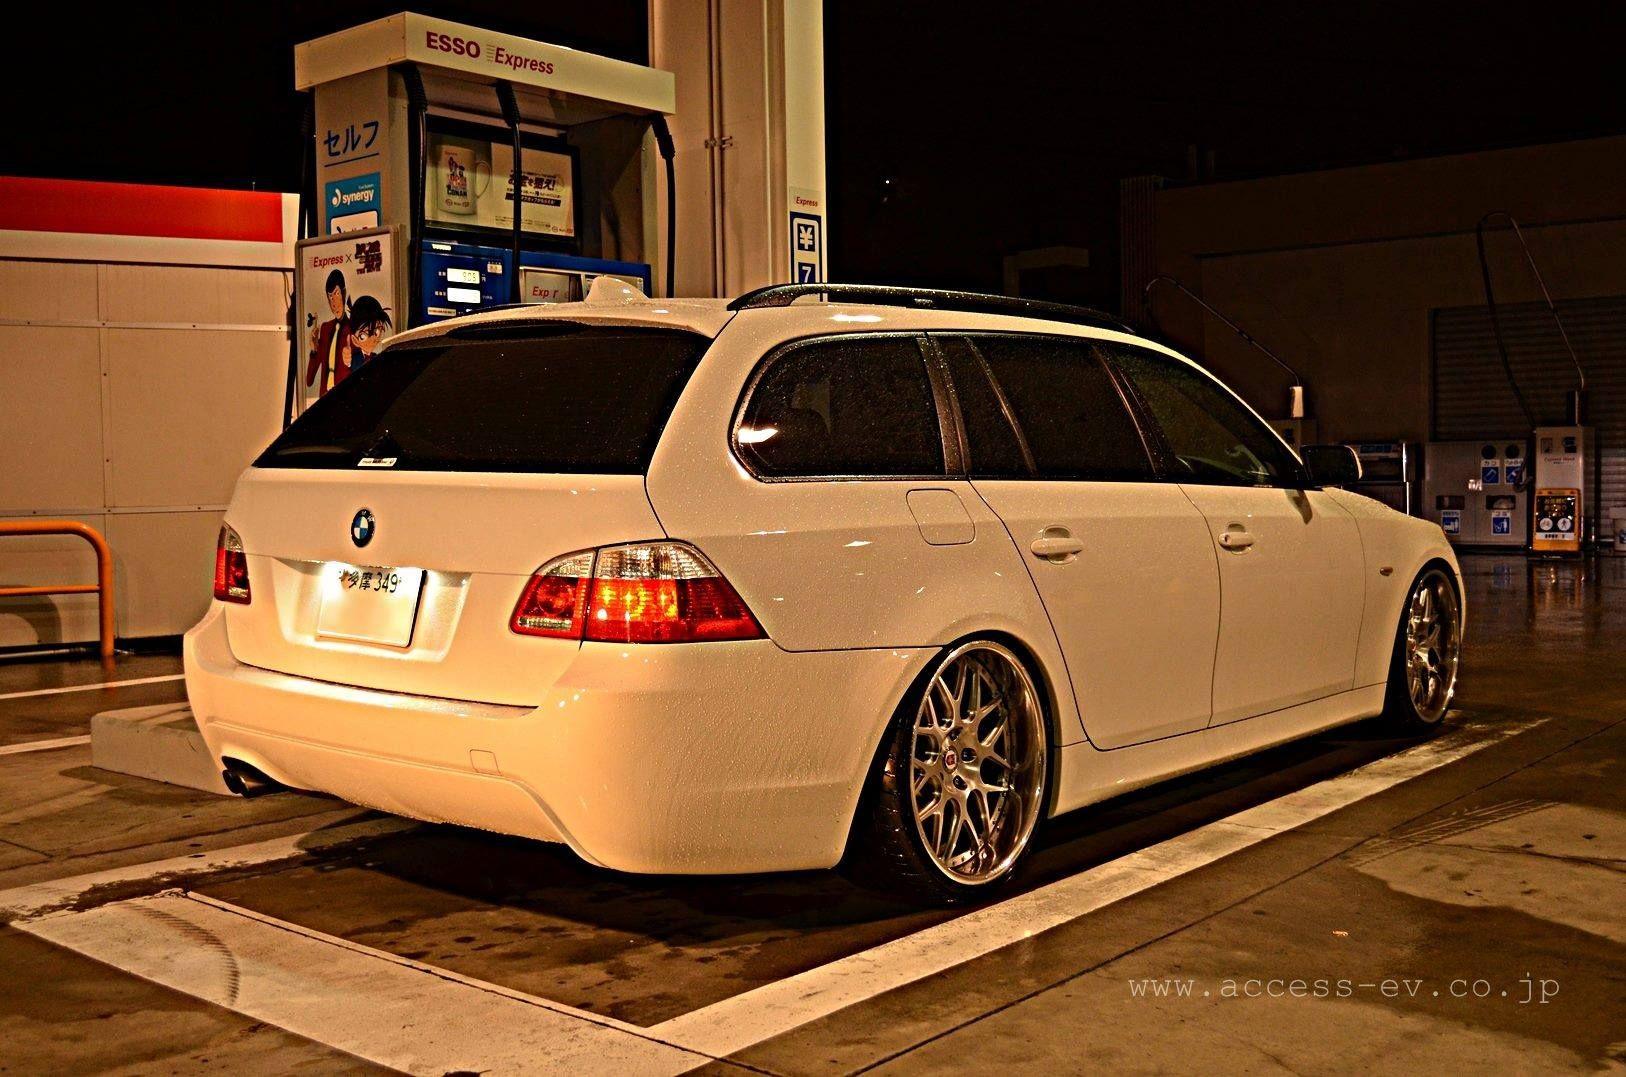 E60 wagon BMW Bmw wagon, Wagon cars, Bmw series